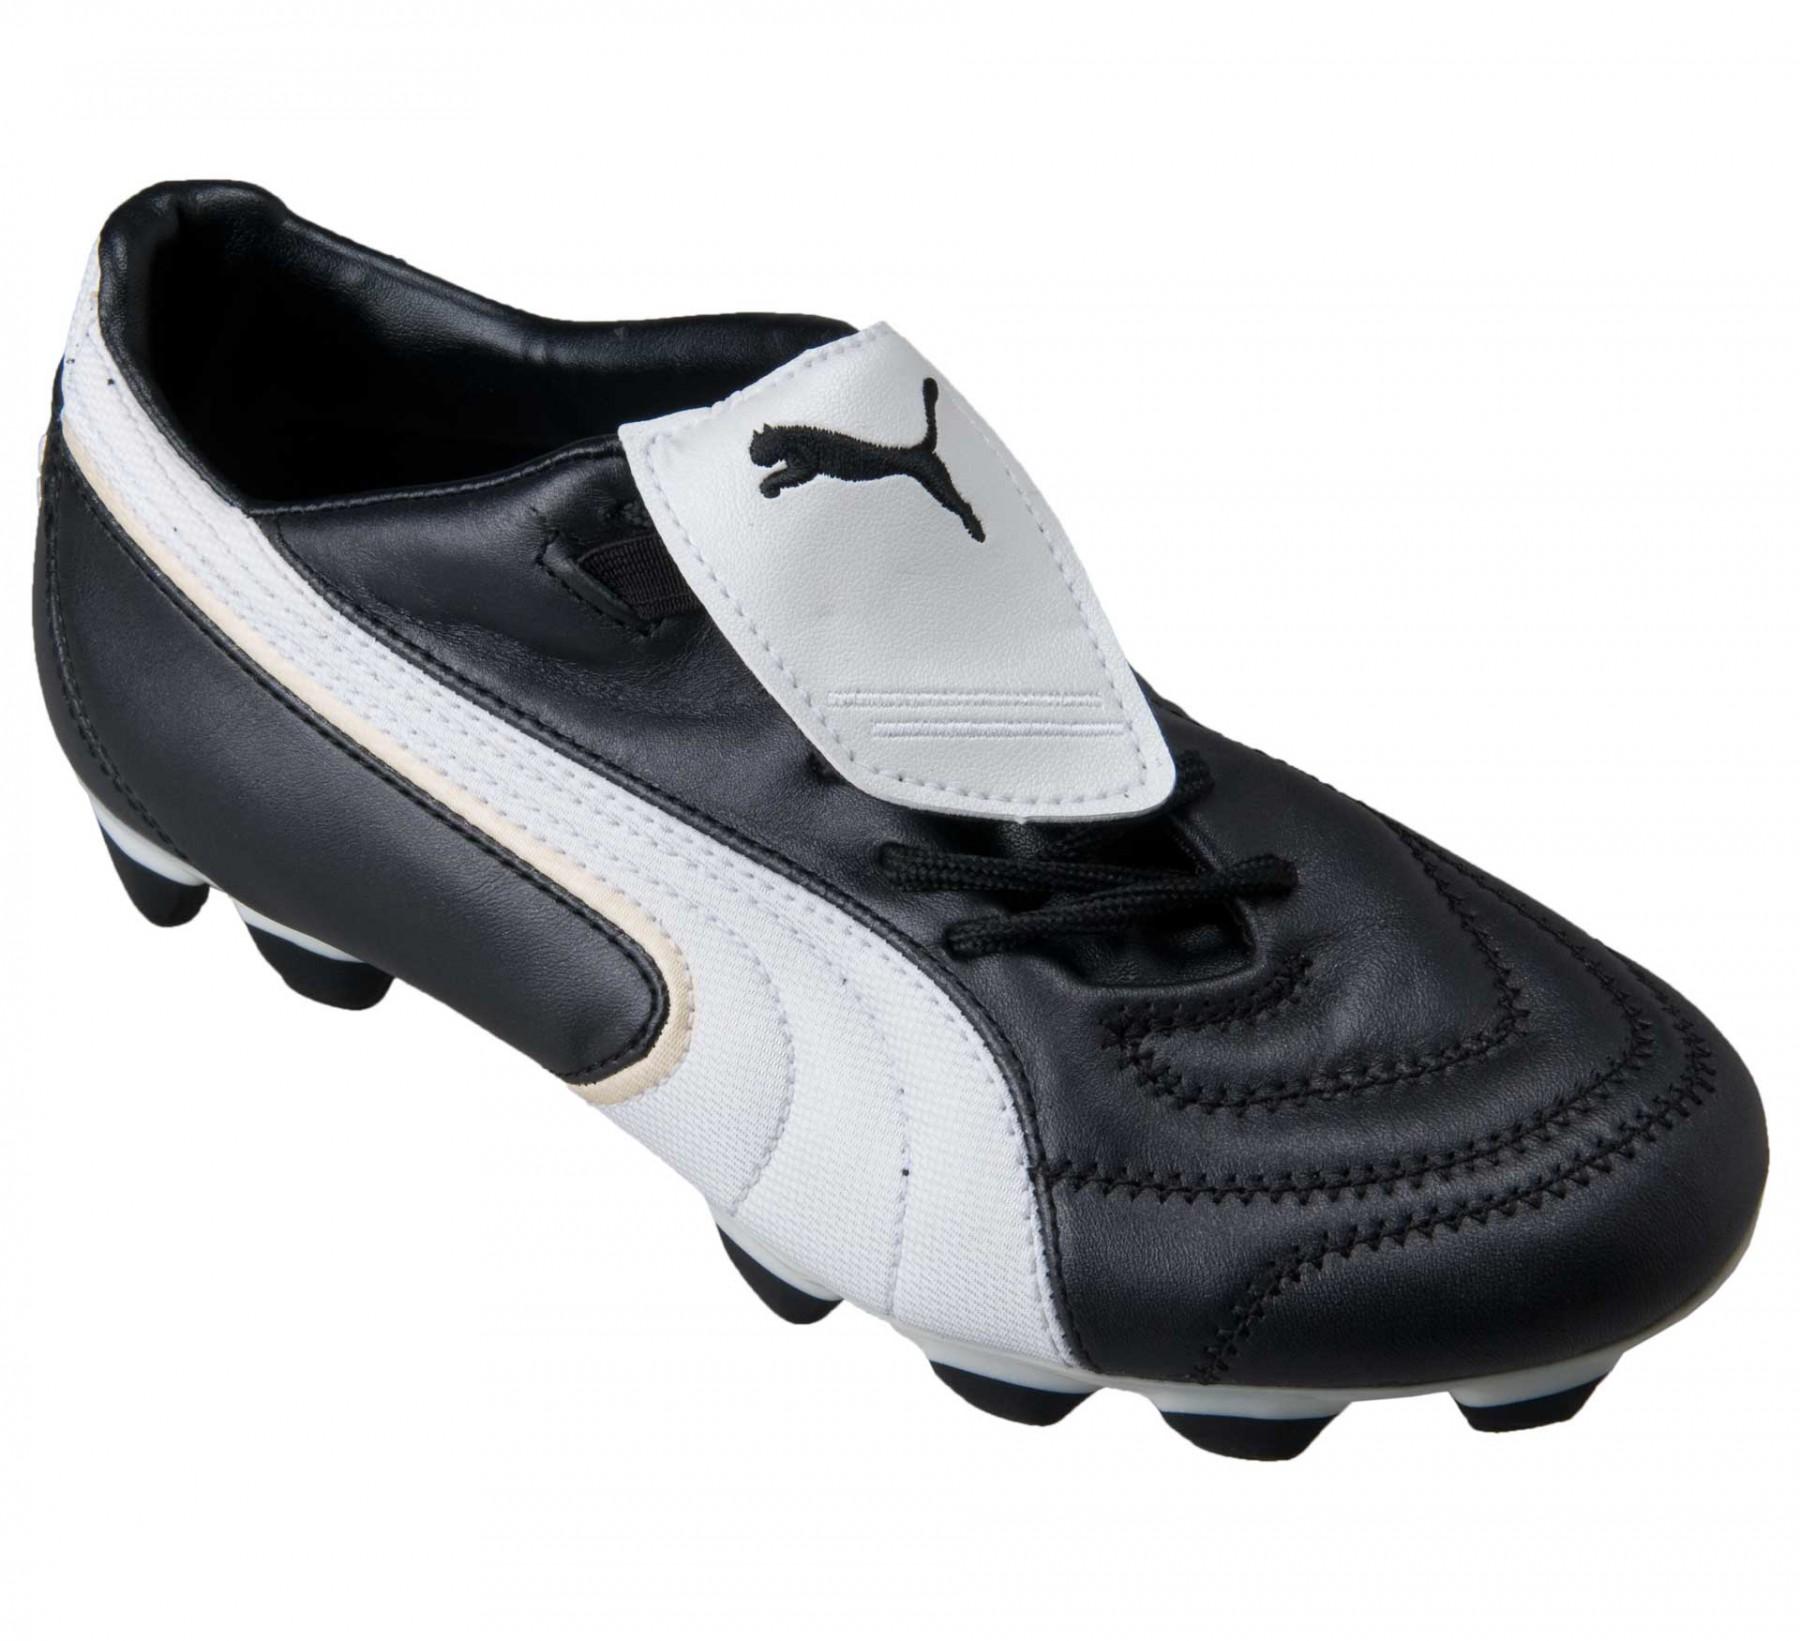 37d0f25258e038 MN Sport - BUTY Puma King Exec FG 100887 01 - Sklep piłkarski ...